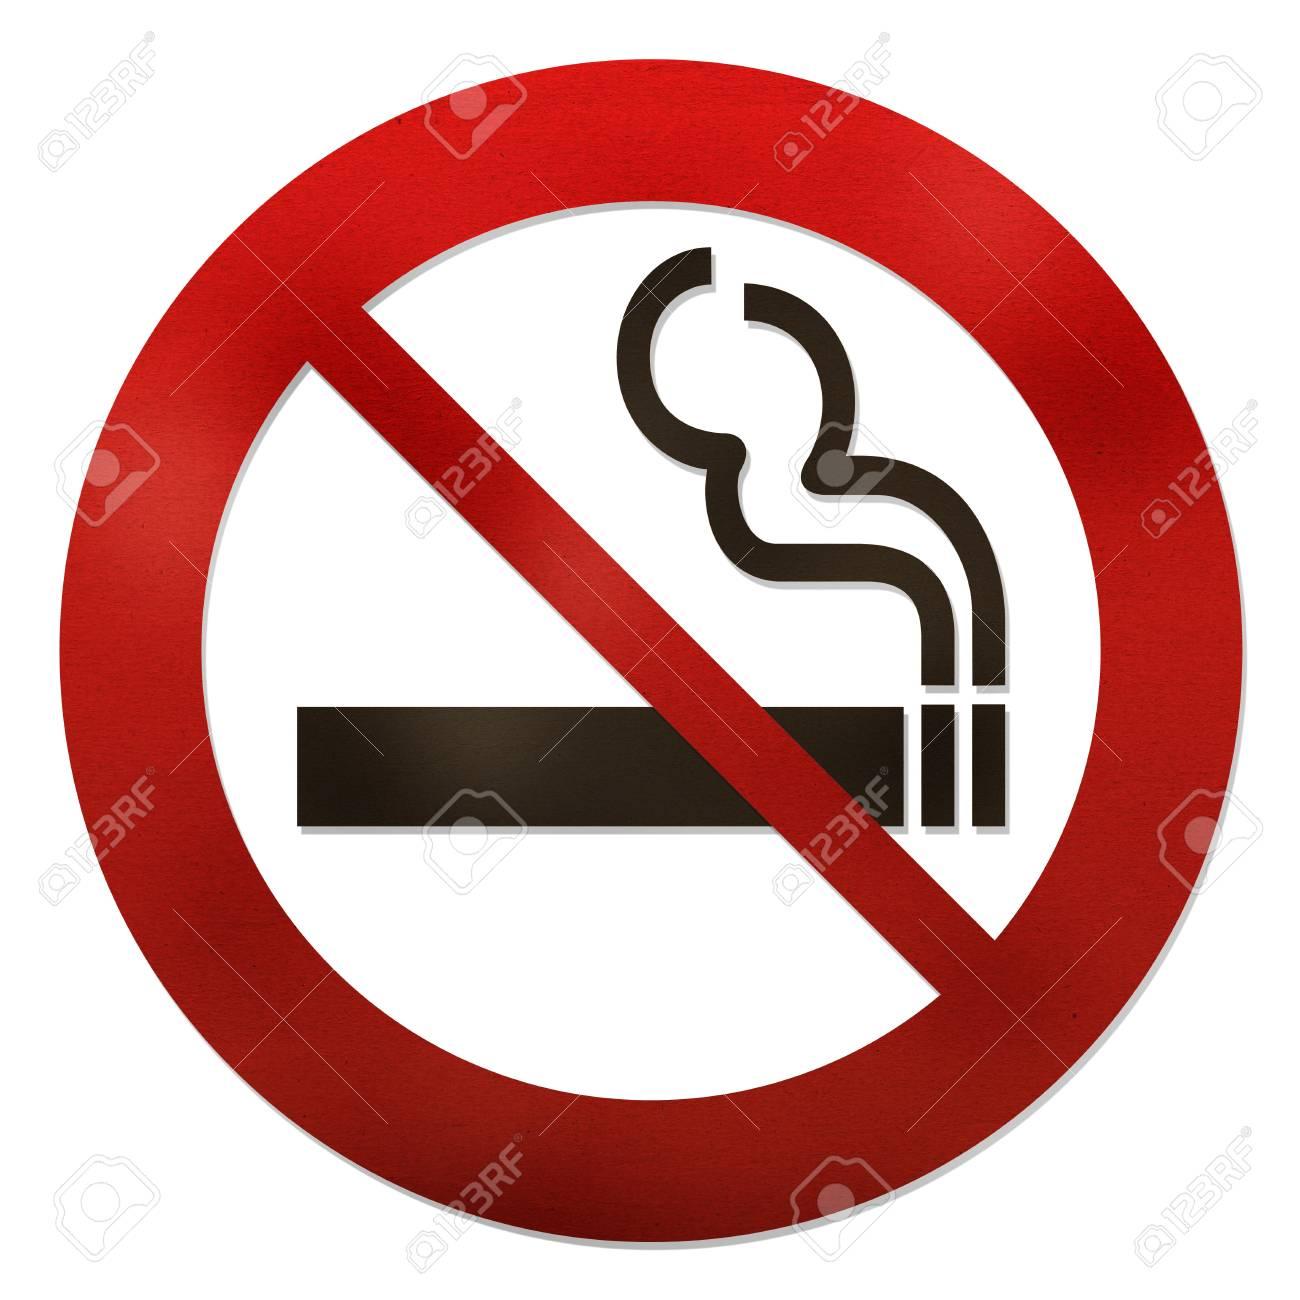 No smoking grunge texture sign on white Stock Photo - 15115231